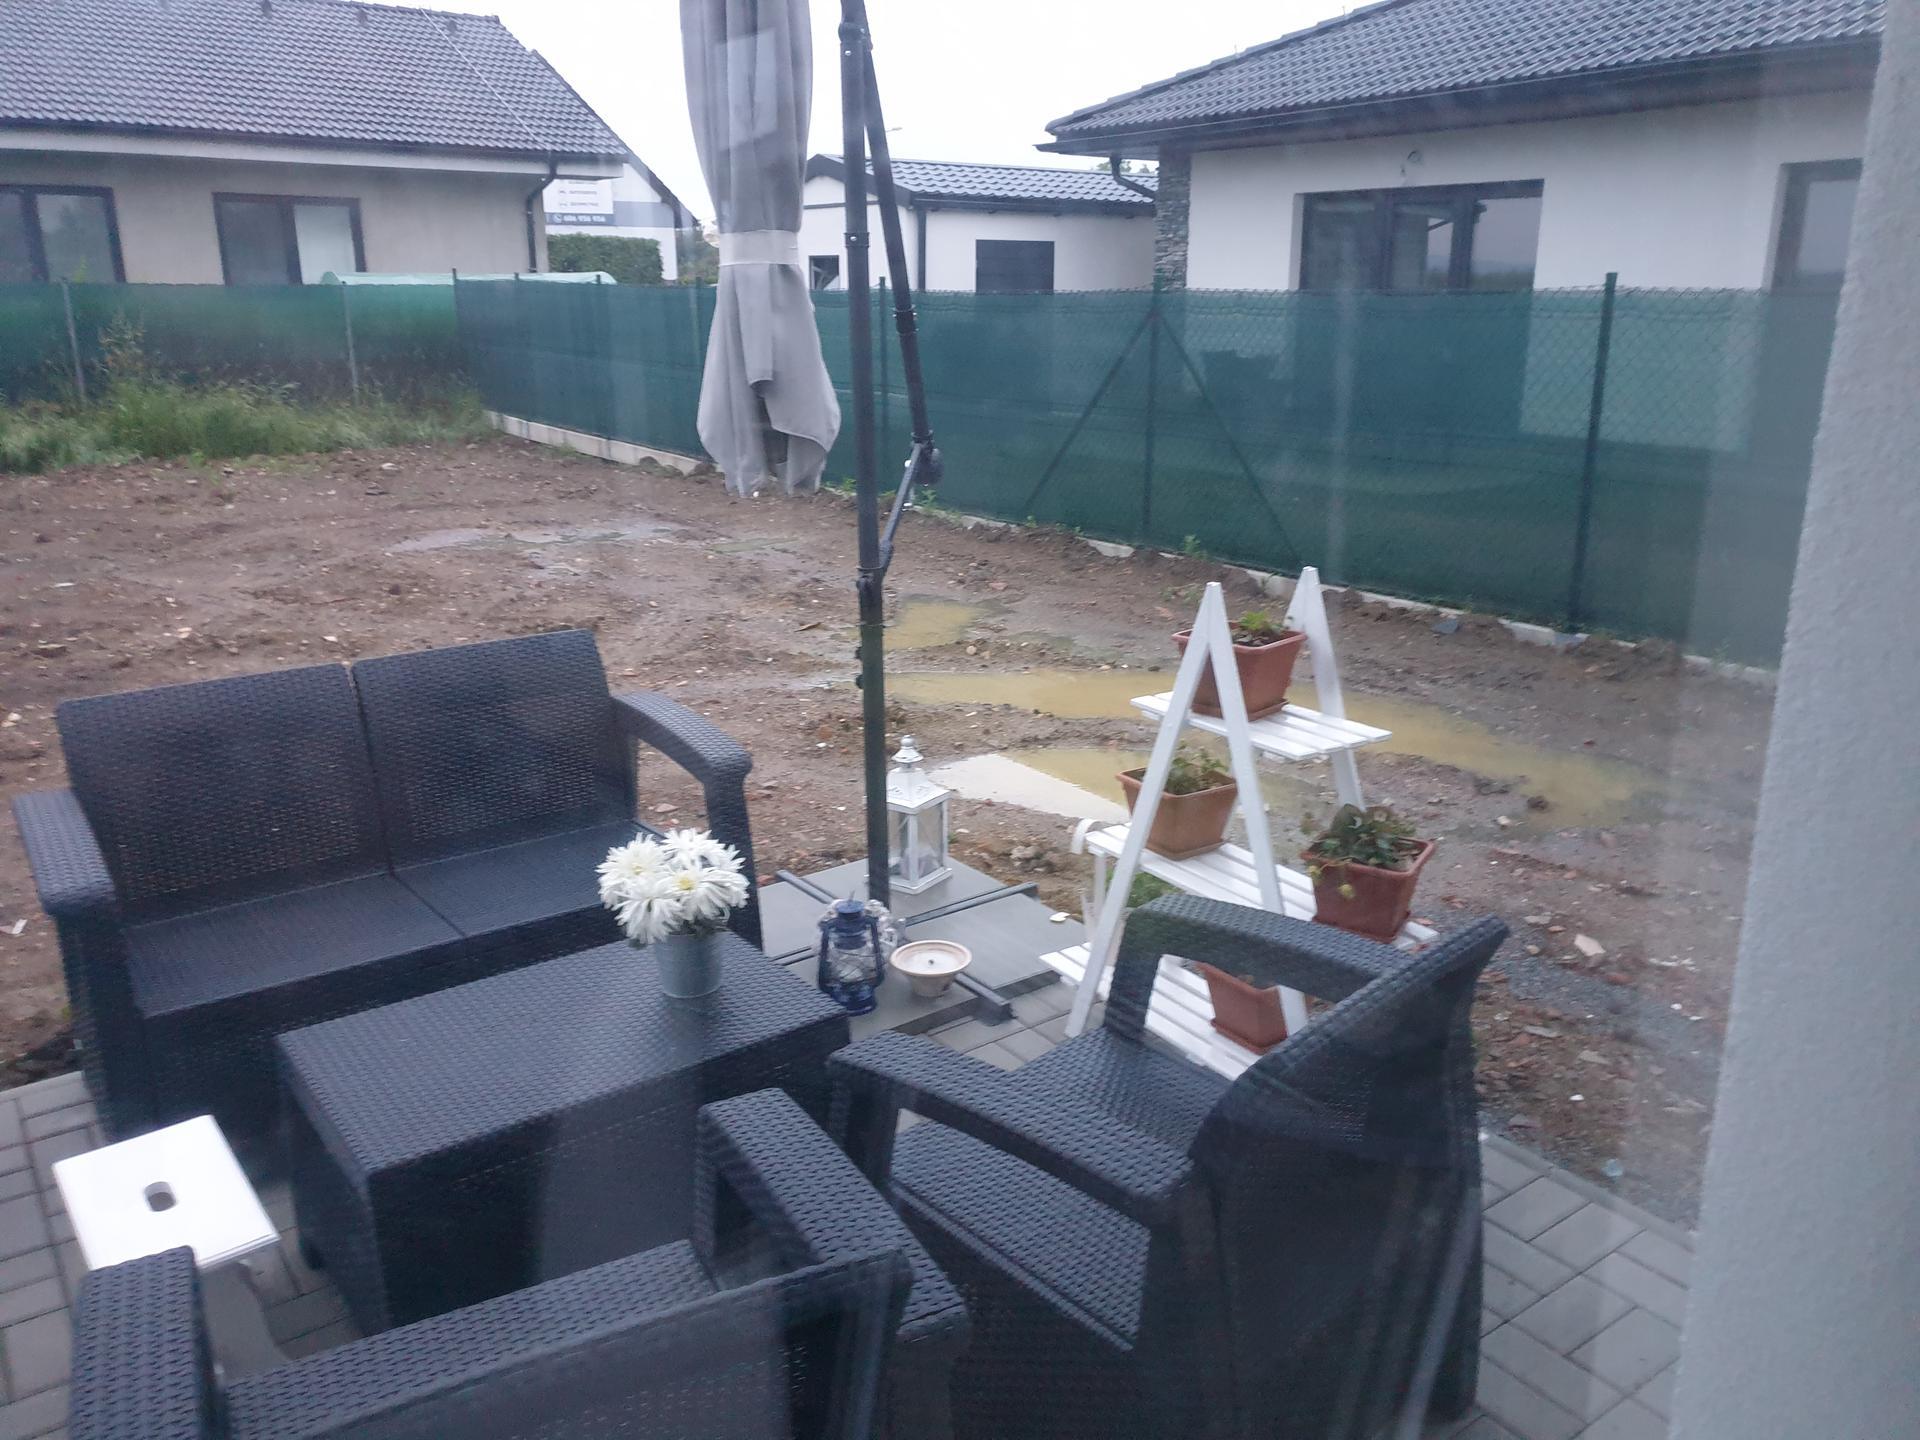 Zahrada a terasa - Obrázek č. 20